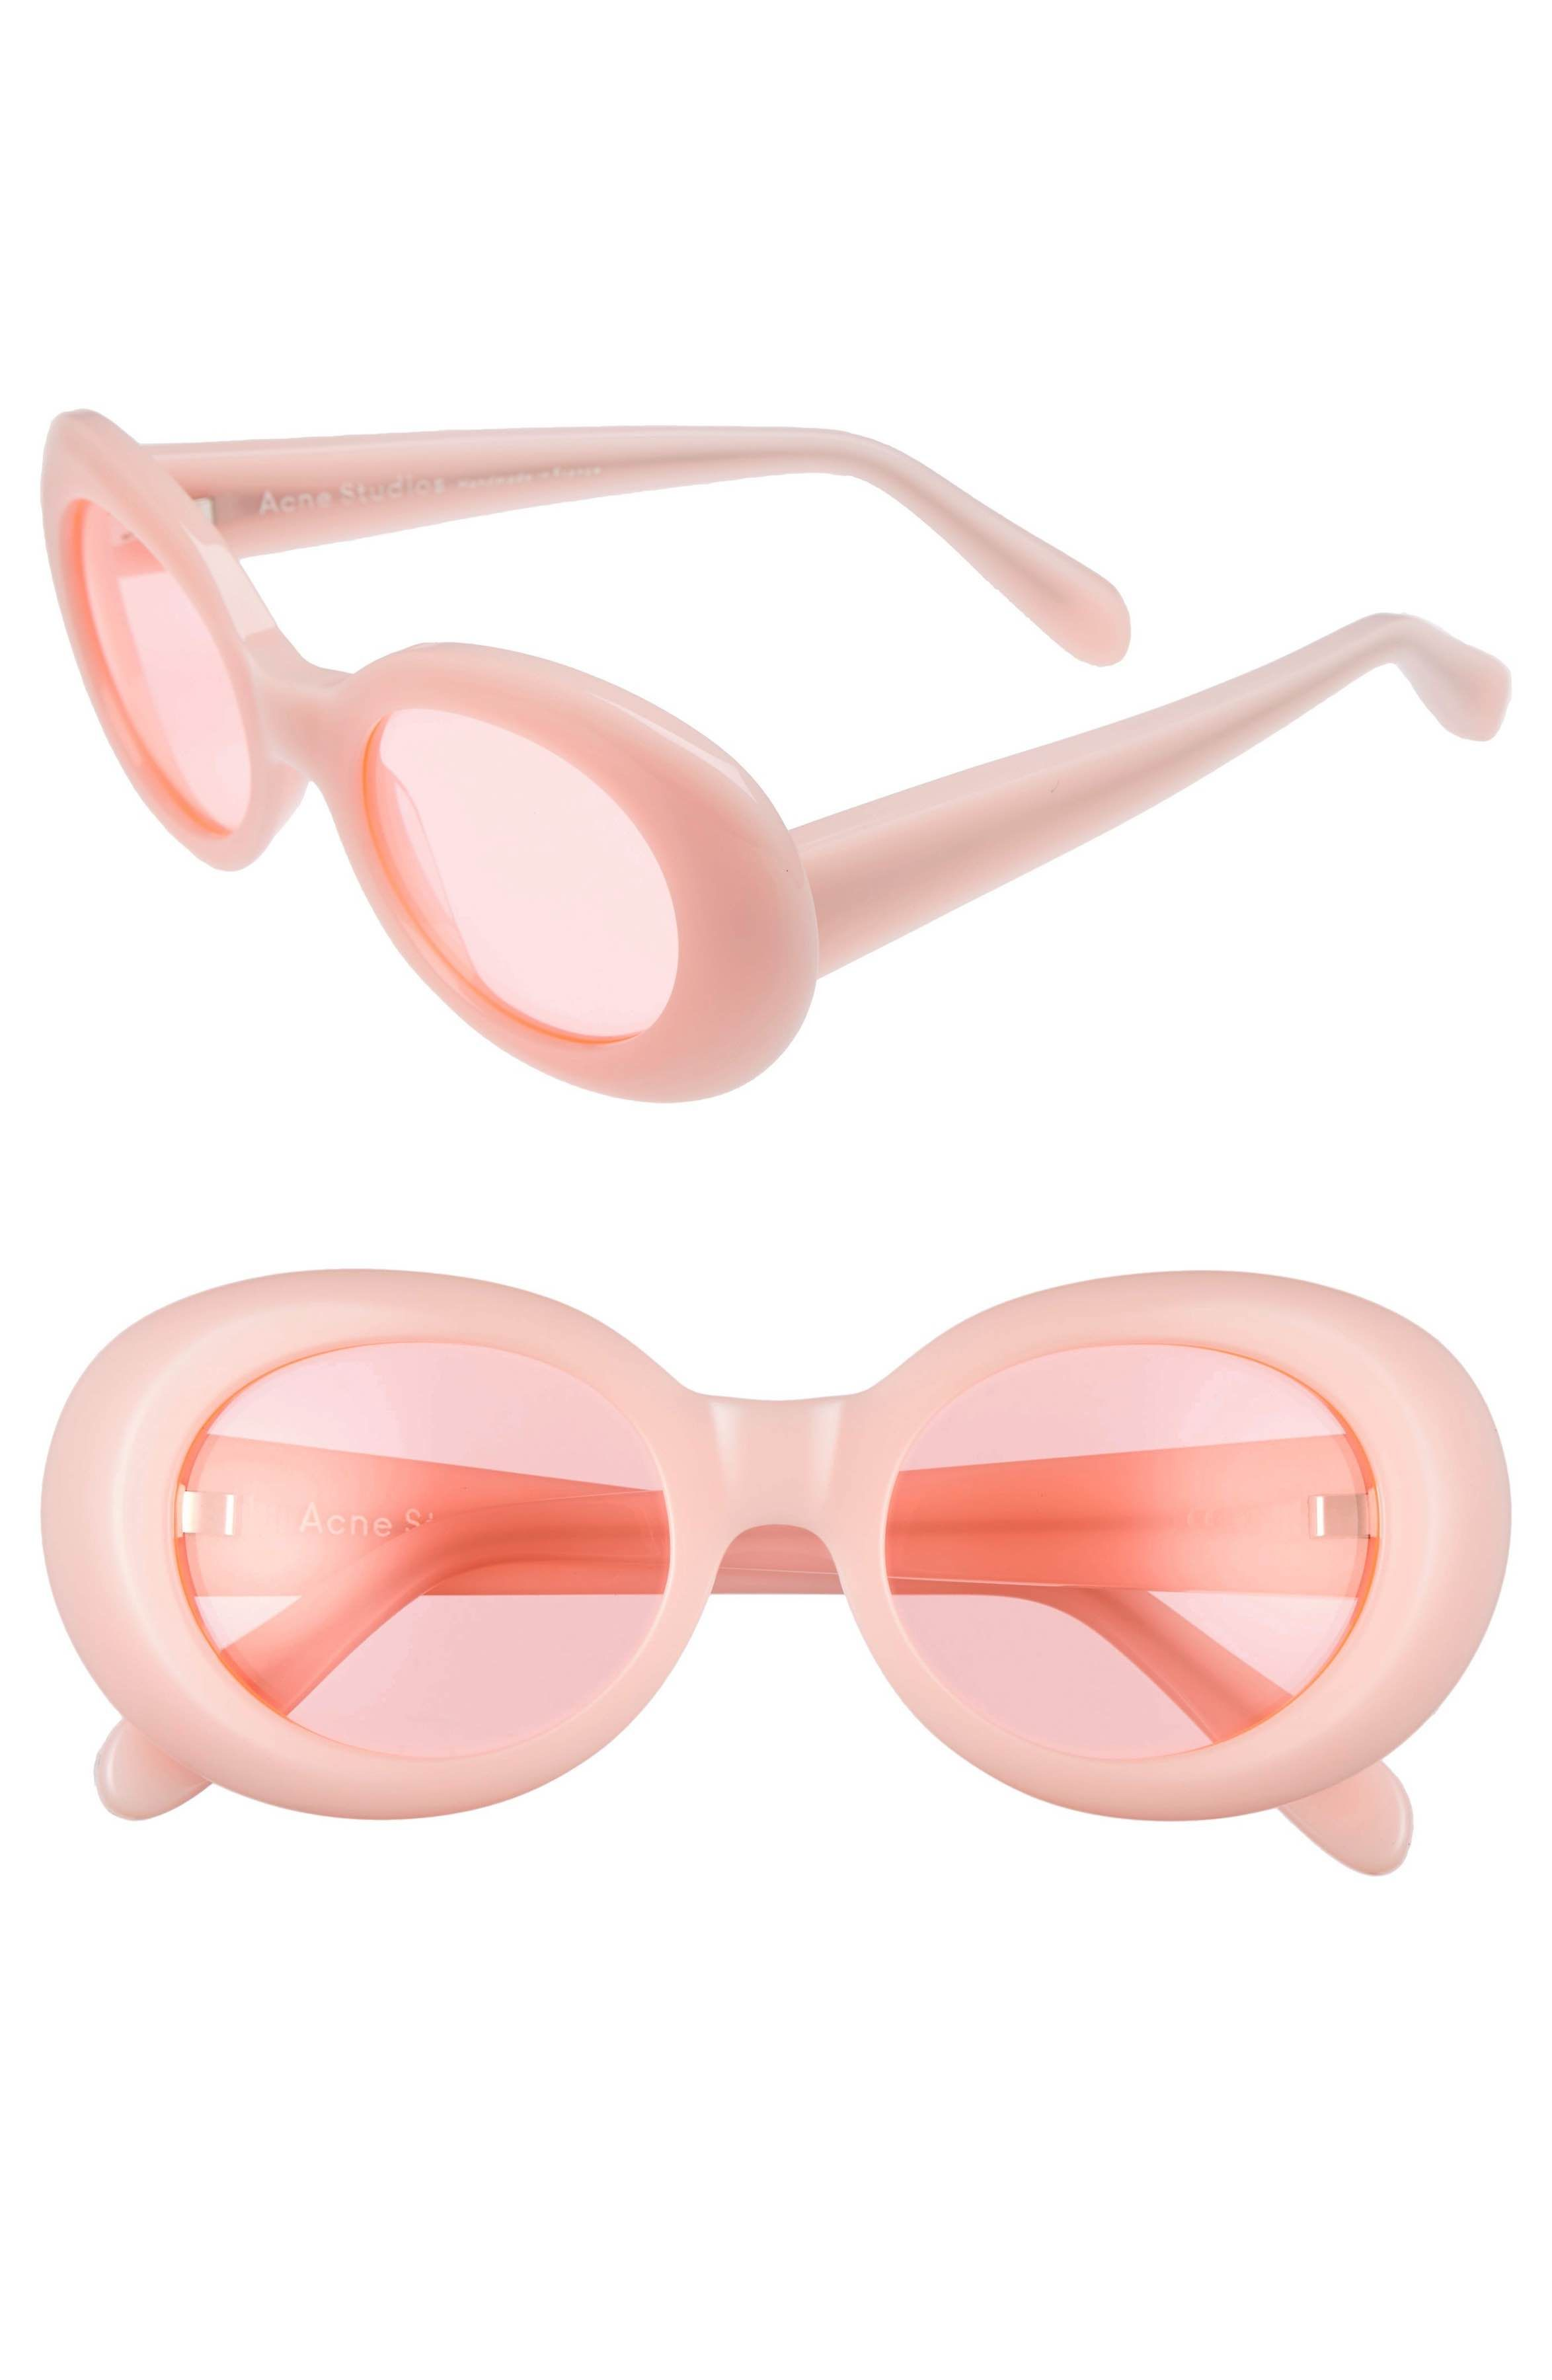 Main Image ACNE Studios Mustang 47mm Oval Sunglasses